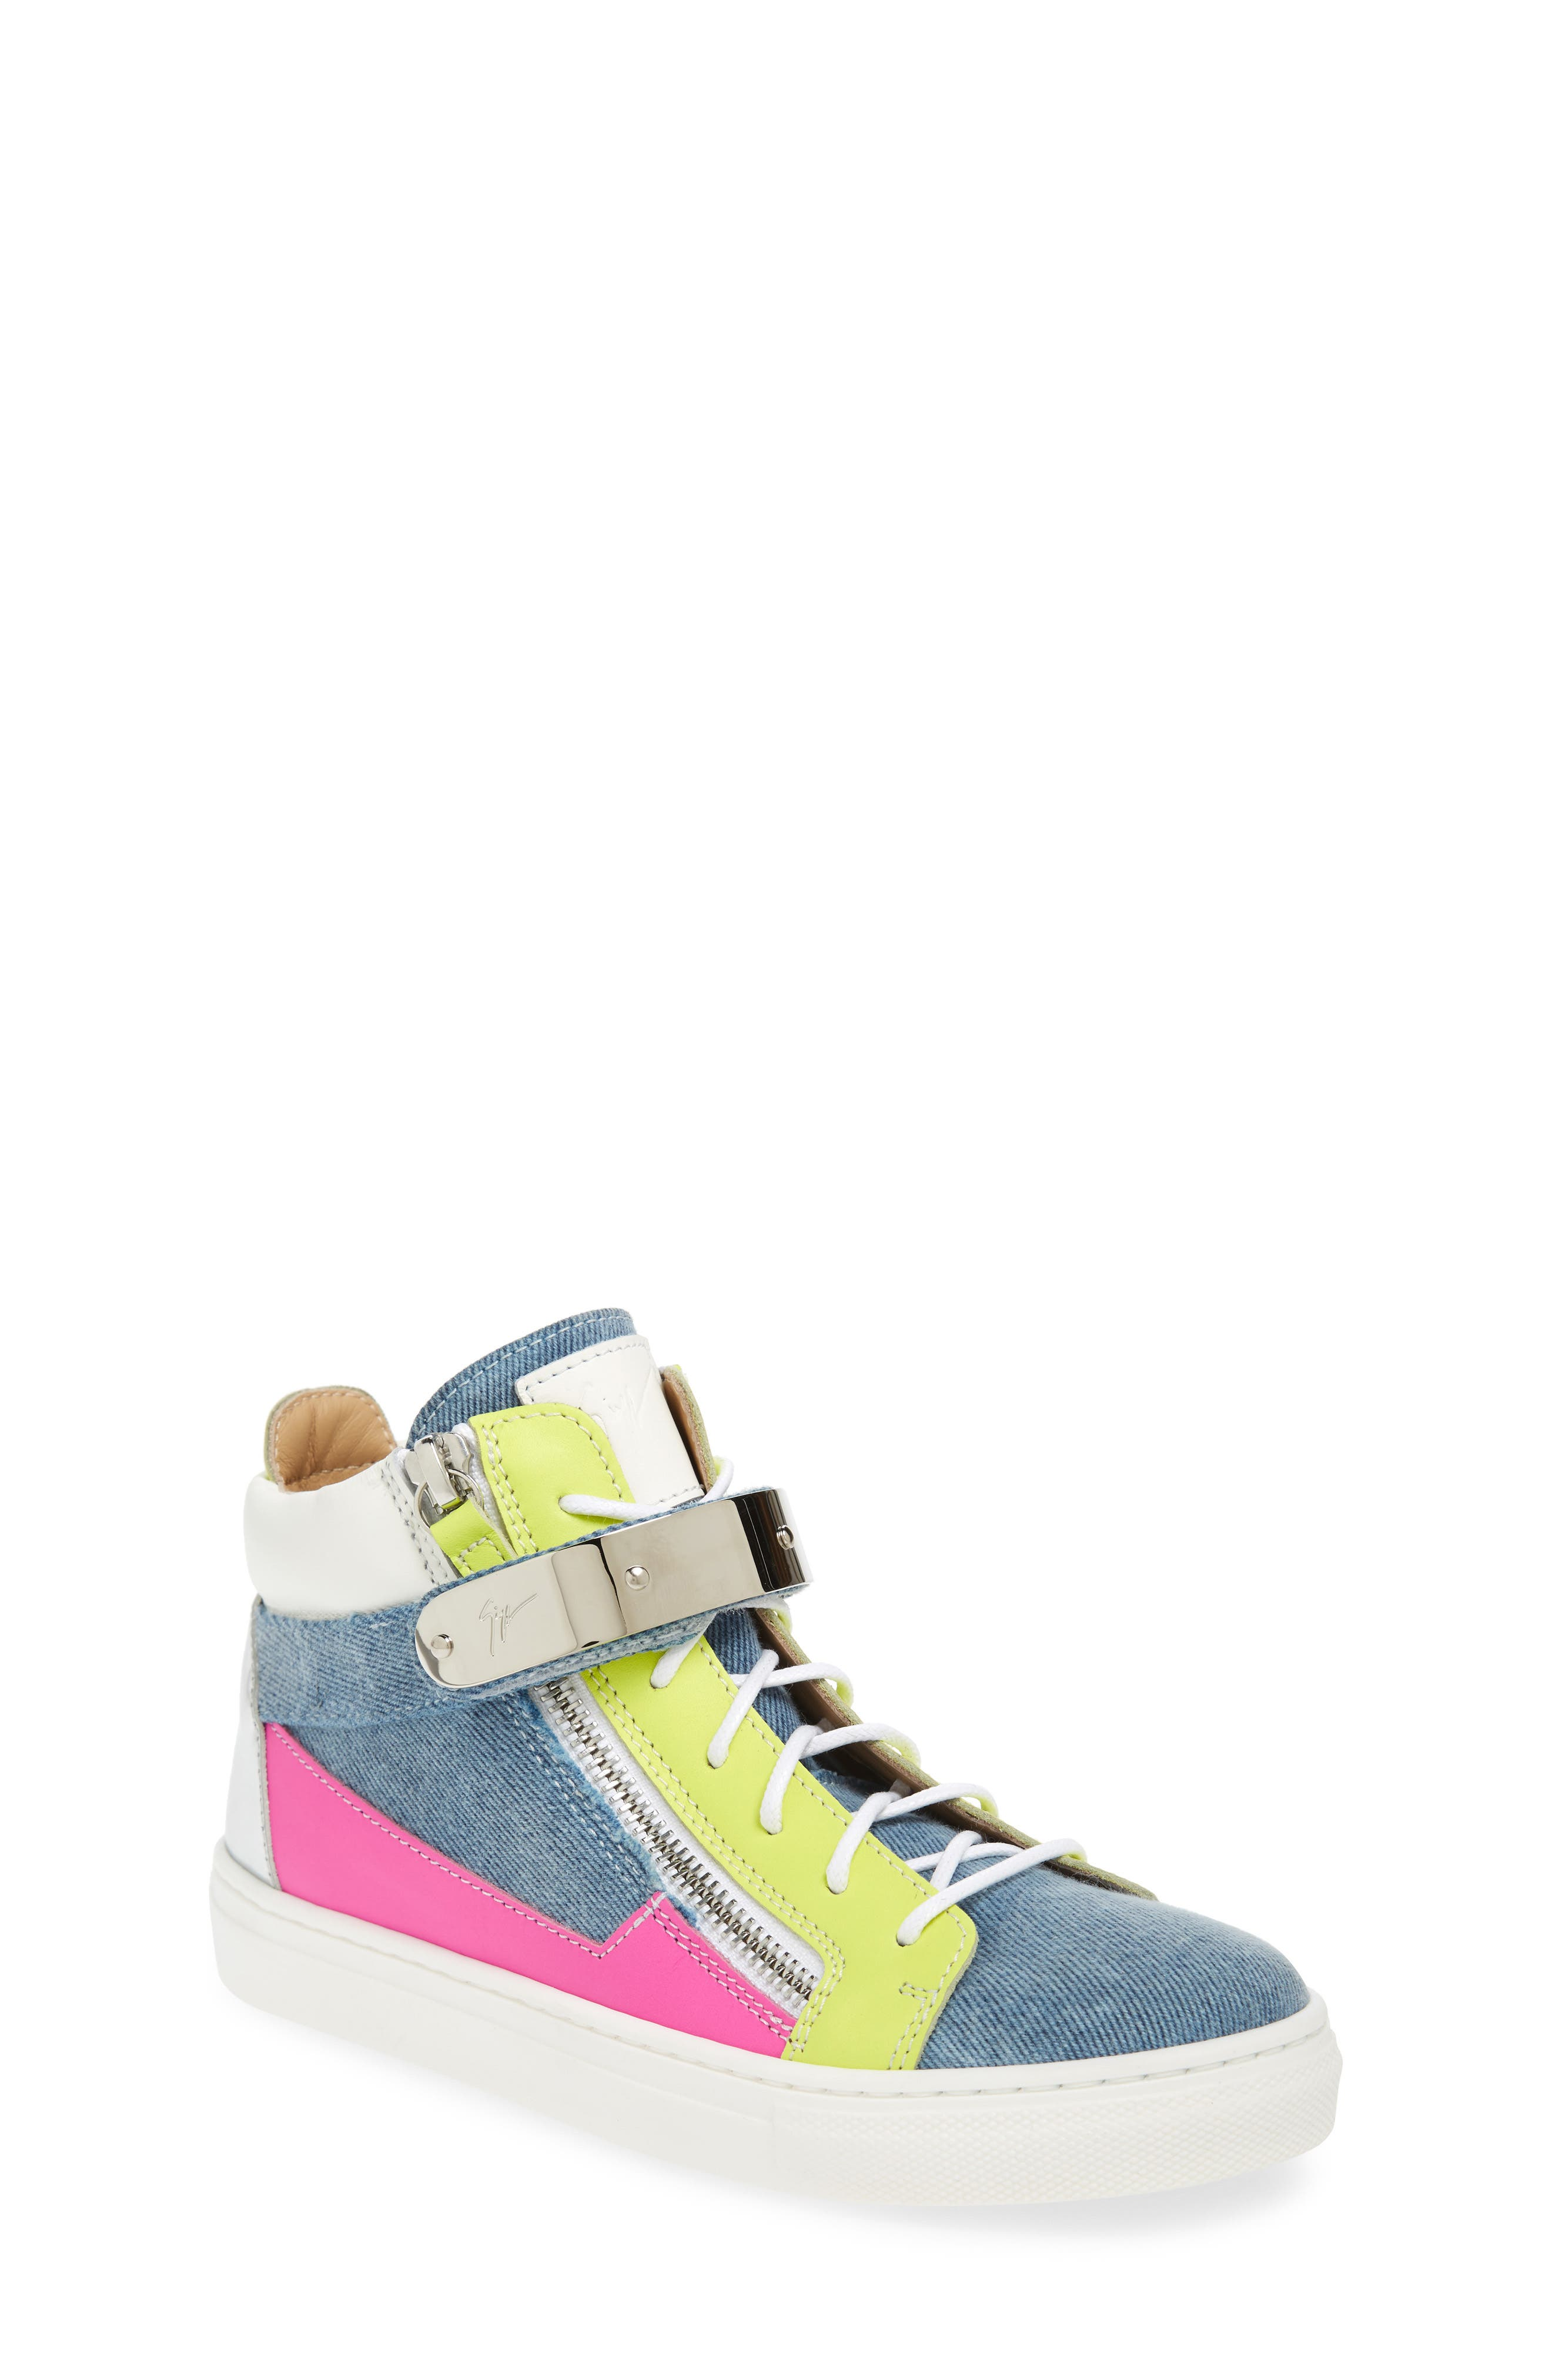 Giuseppe Zanotti London High Top Sneaker (Baby, Walker, Toddler & Little Kid)